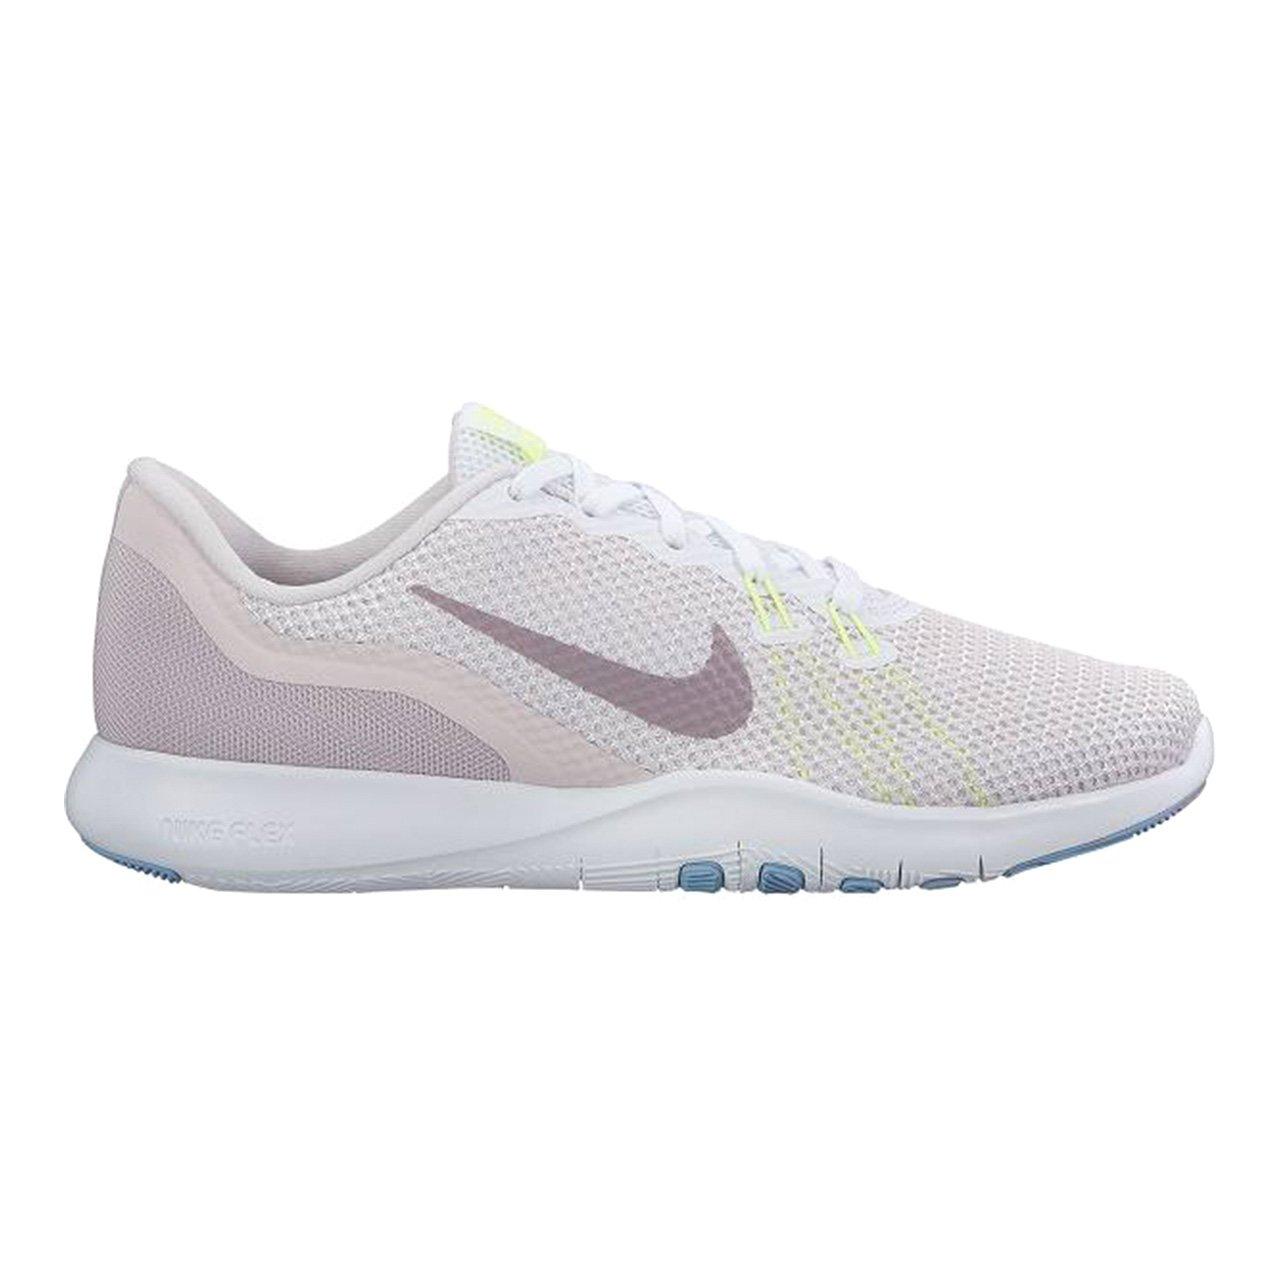 MultiCouleure (blanc Elemental Rose 104) Nike Flex Trainer 7, Chaussures de Running Compétition Femme 36 EU